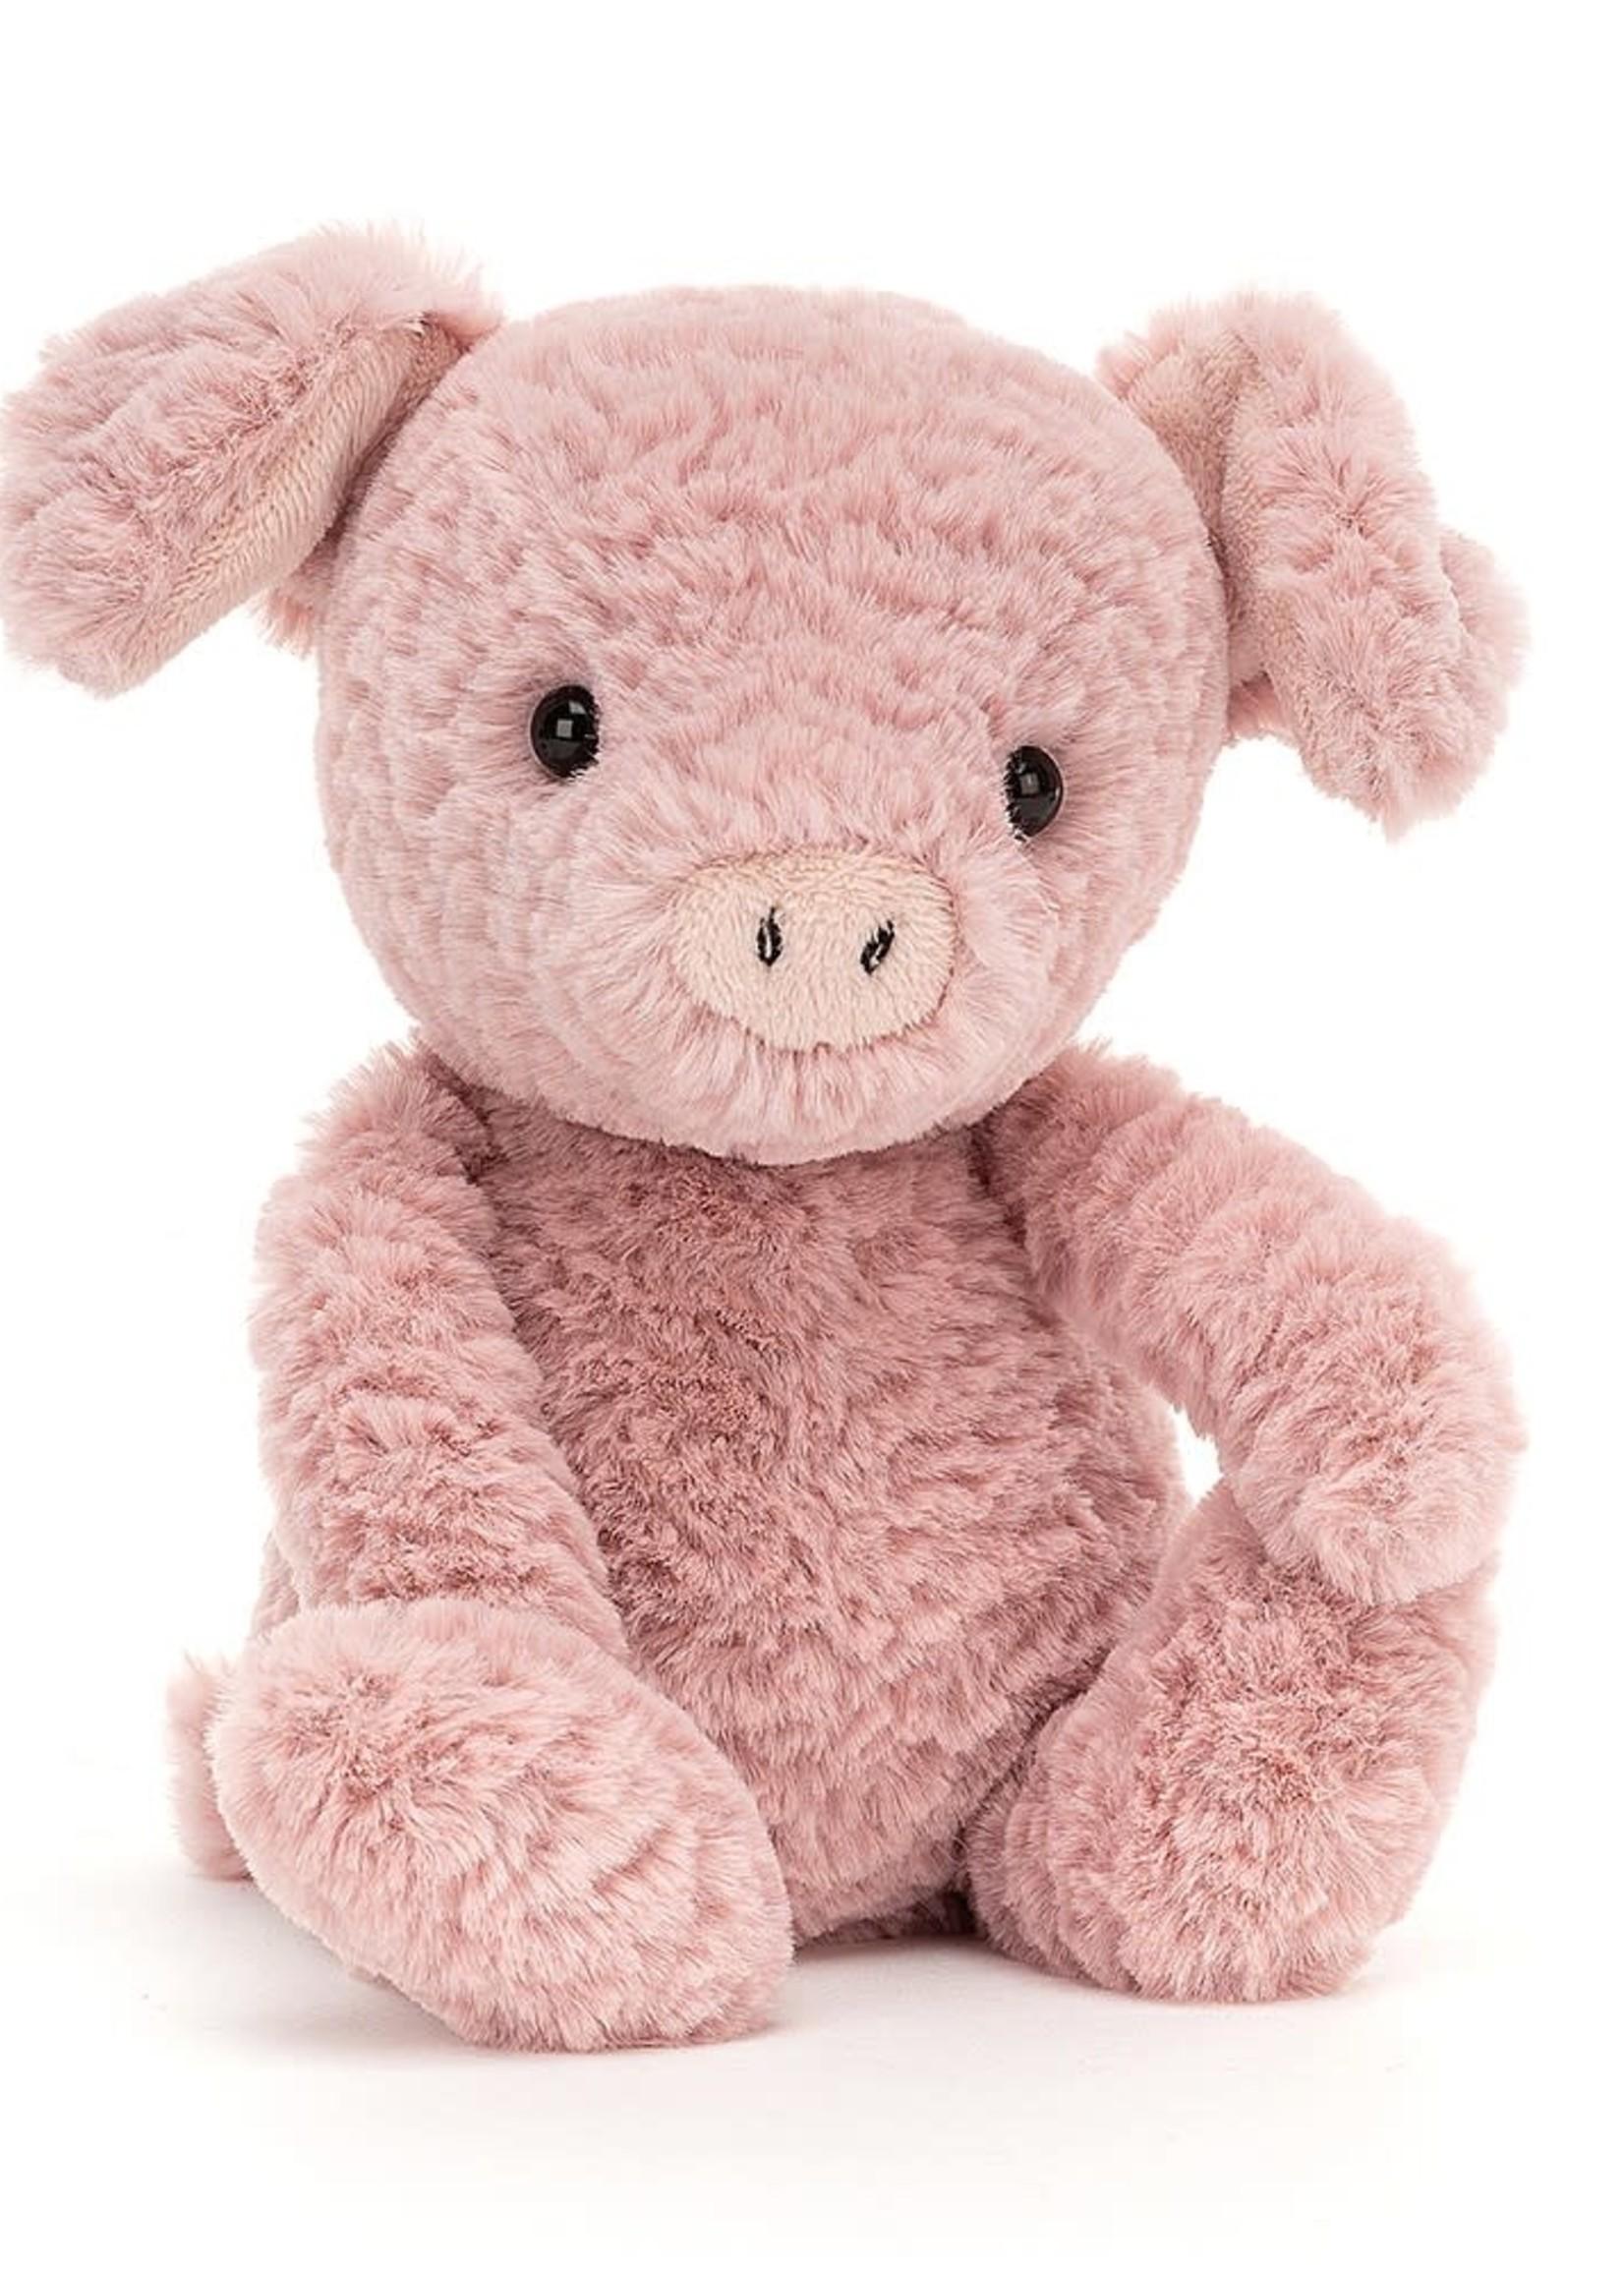 Jellycat JC Tumbletuft Pig